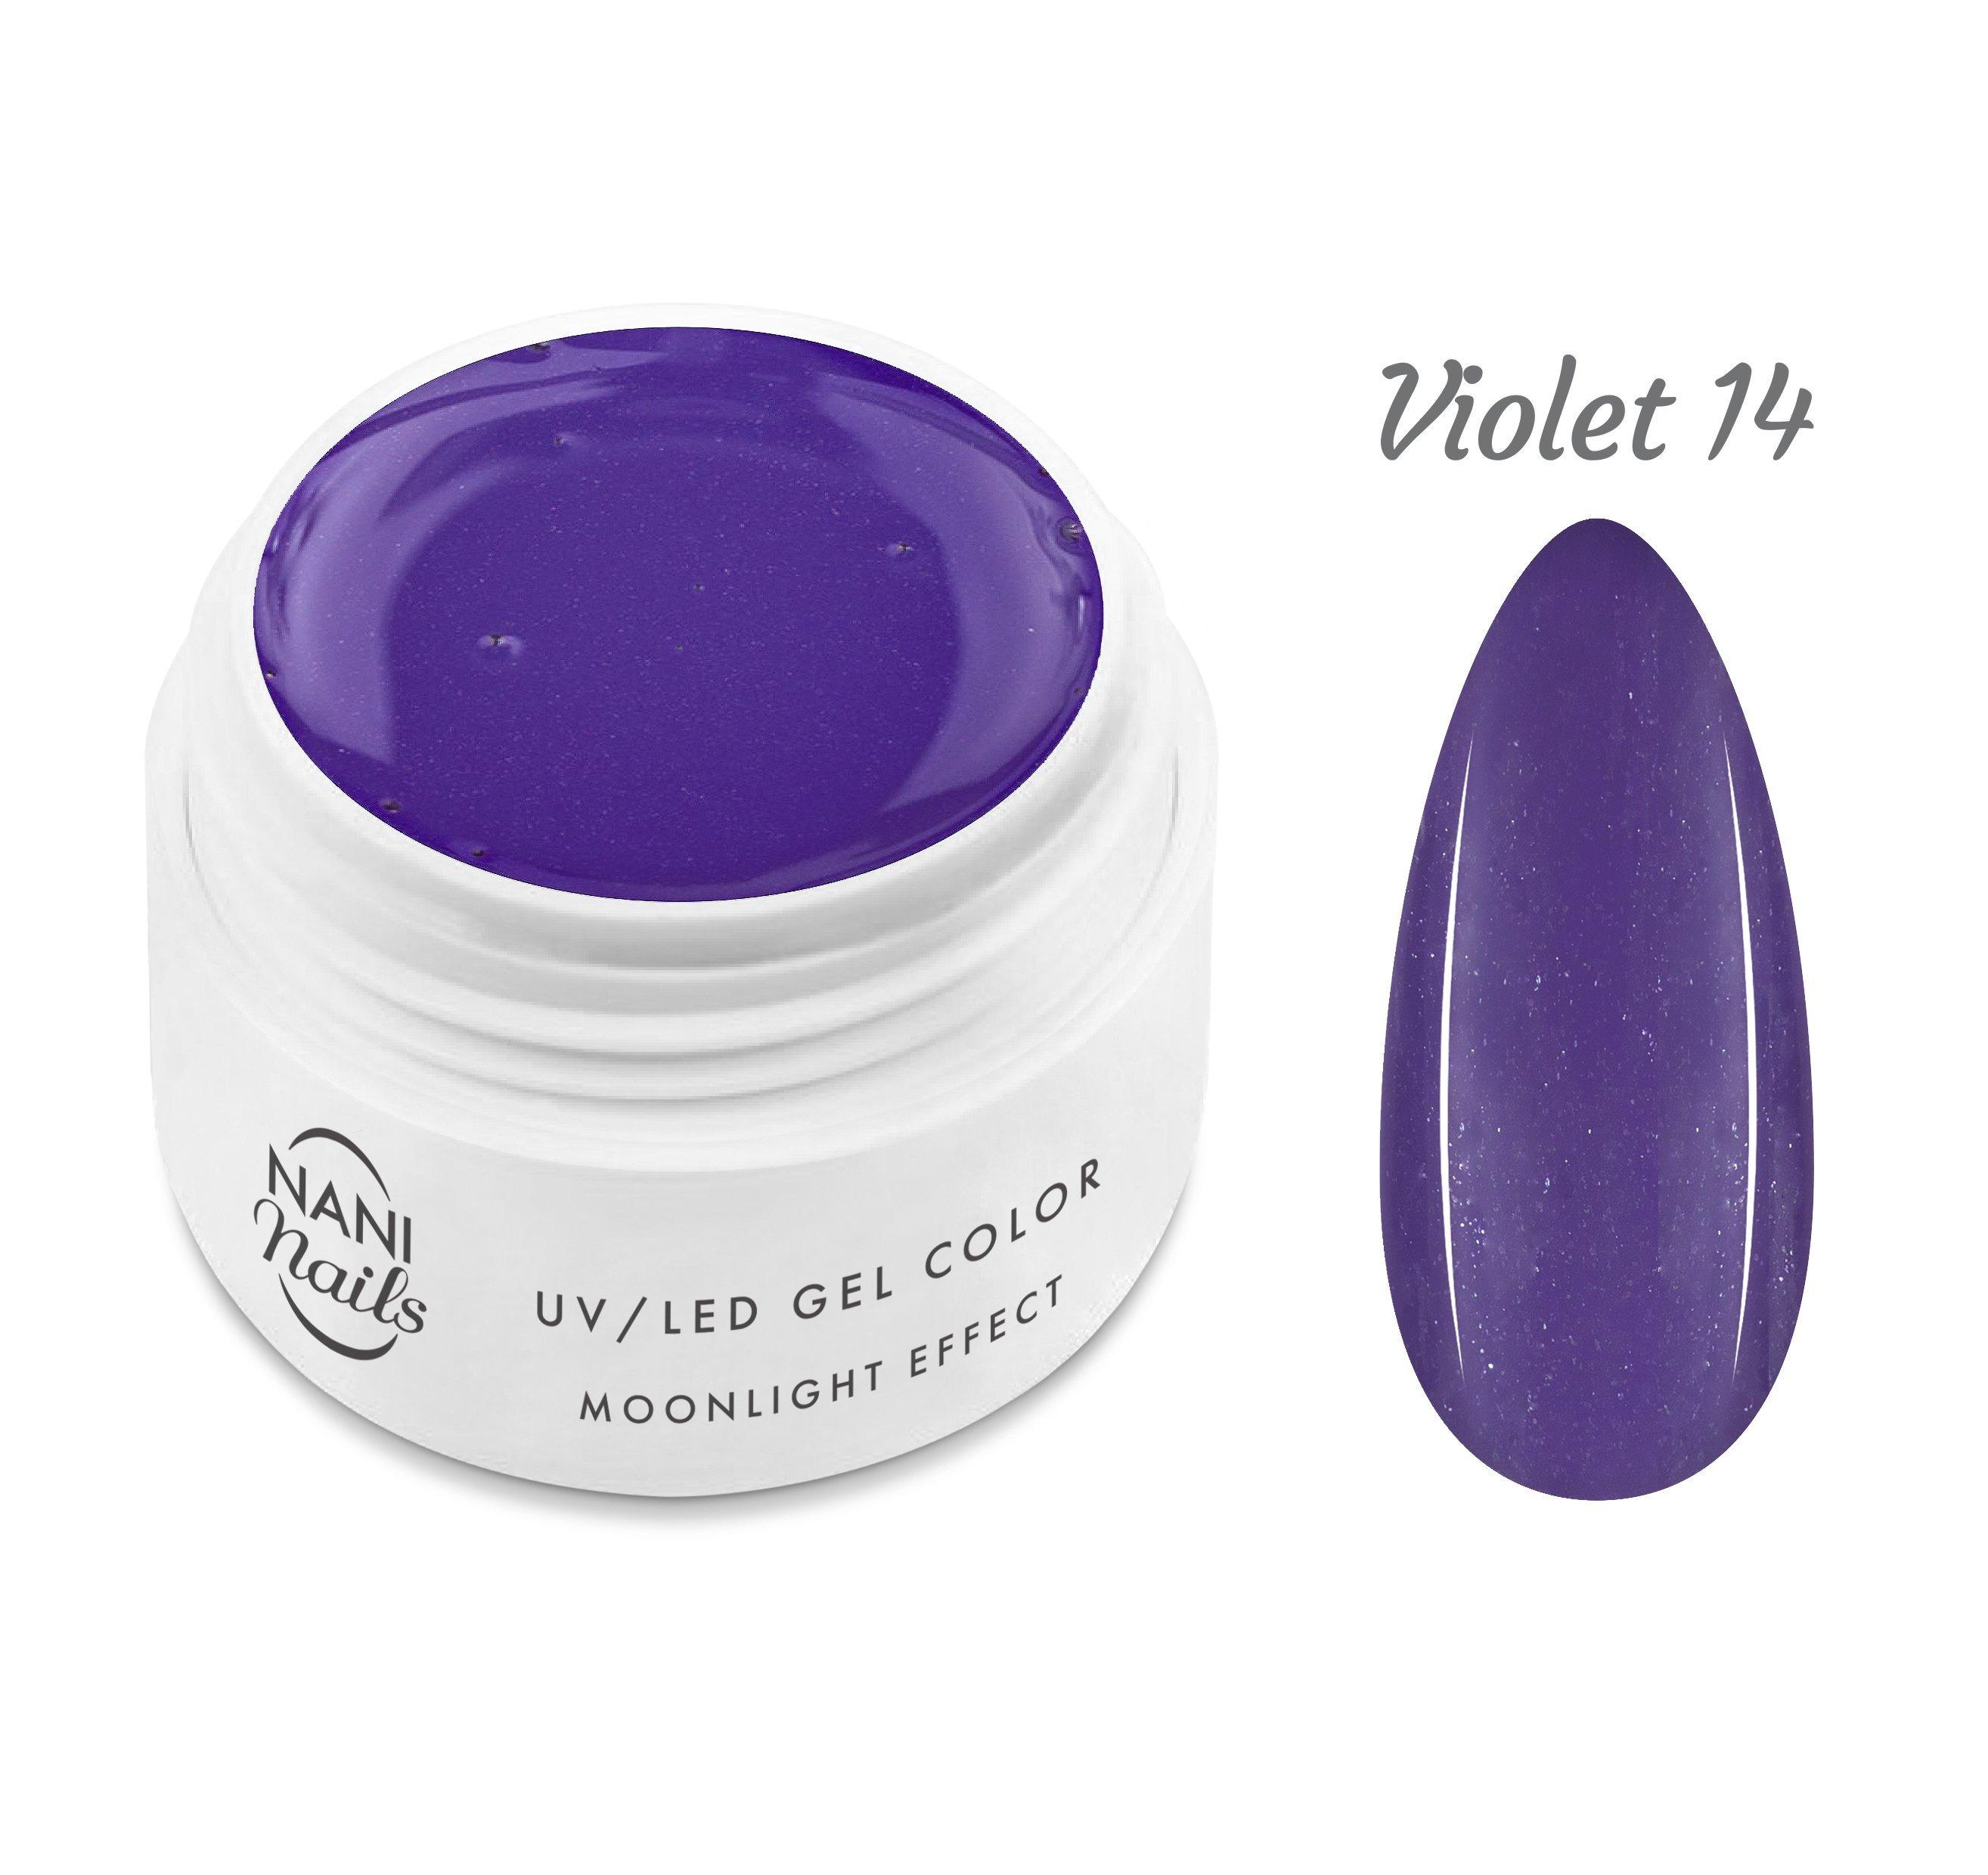 NANI UV gél Moonlight Effect 5 ml - Violet